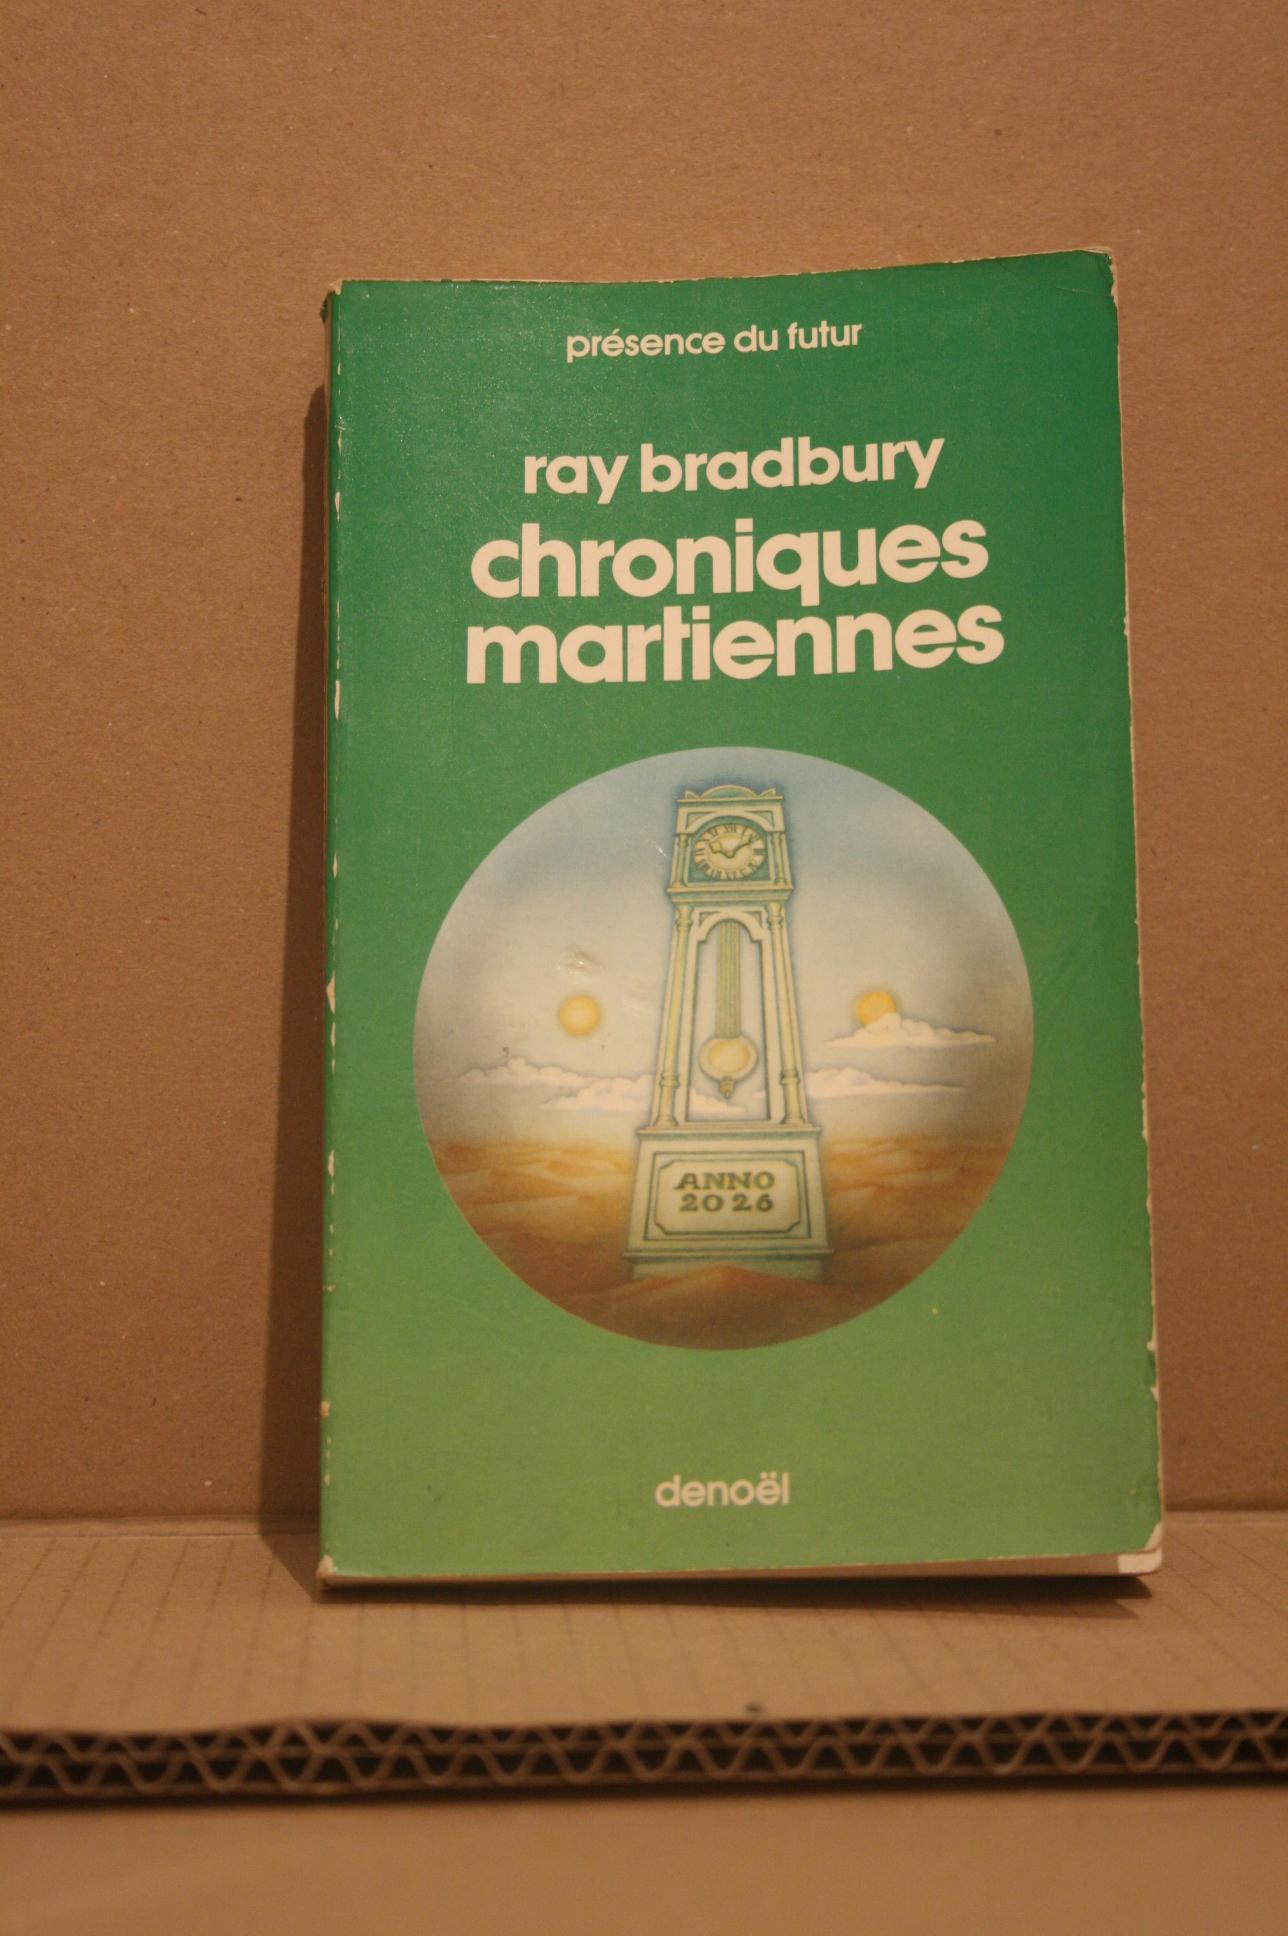 chroniques martiennes de ray bradbury jacques chambon pr sence du futur n 1 librairie scylla. Black Bedroom Furniture Sets. Home Design Ideas